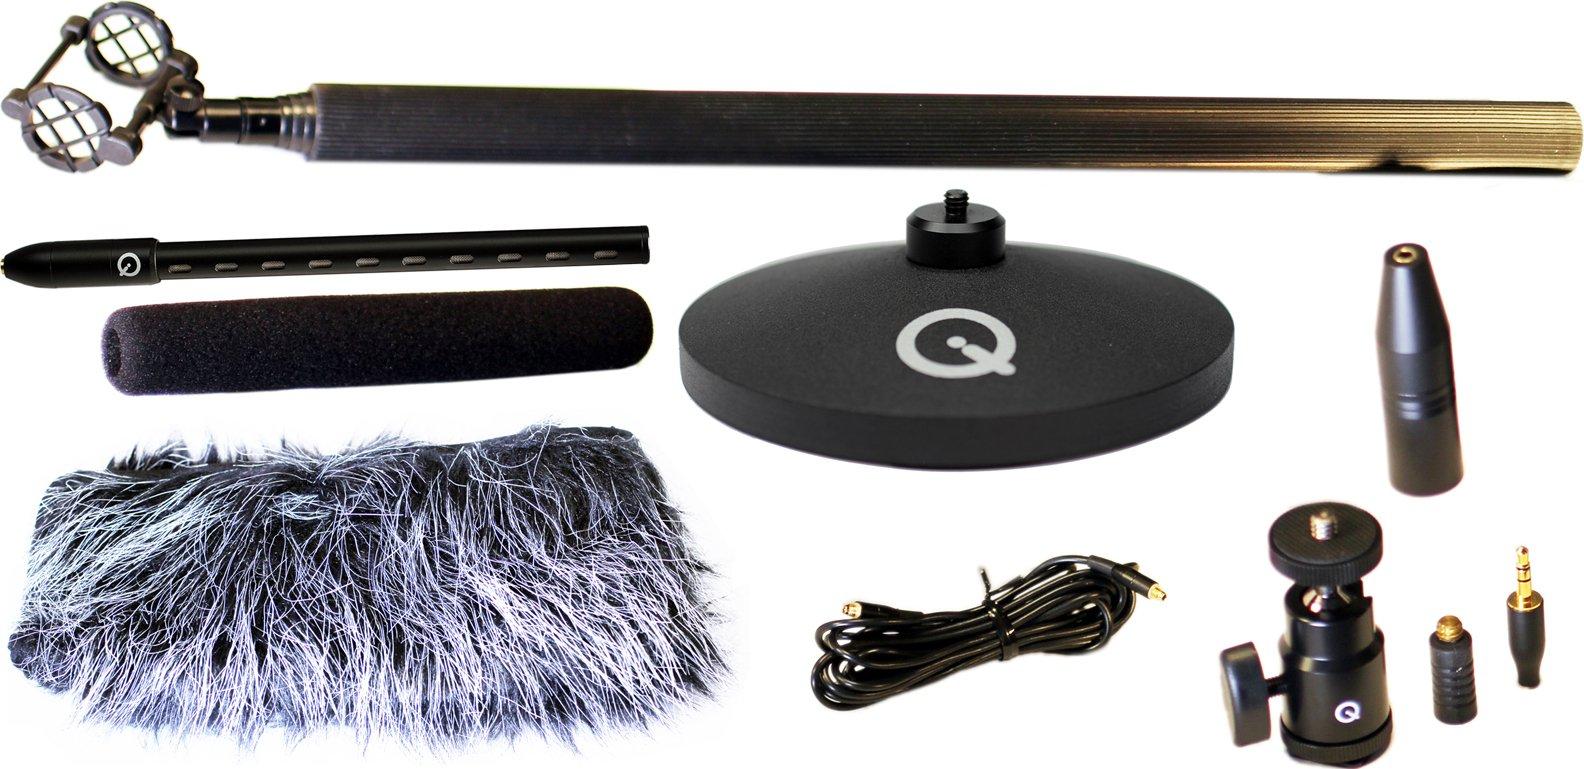 Mini Shotgun Microphone Kit with Shockmount, Shoe Mount, etc.